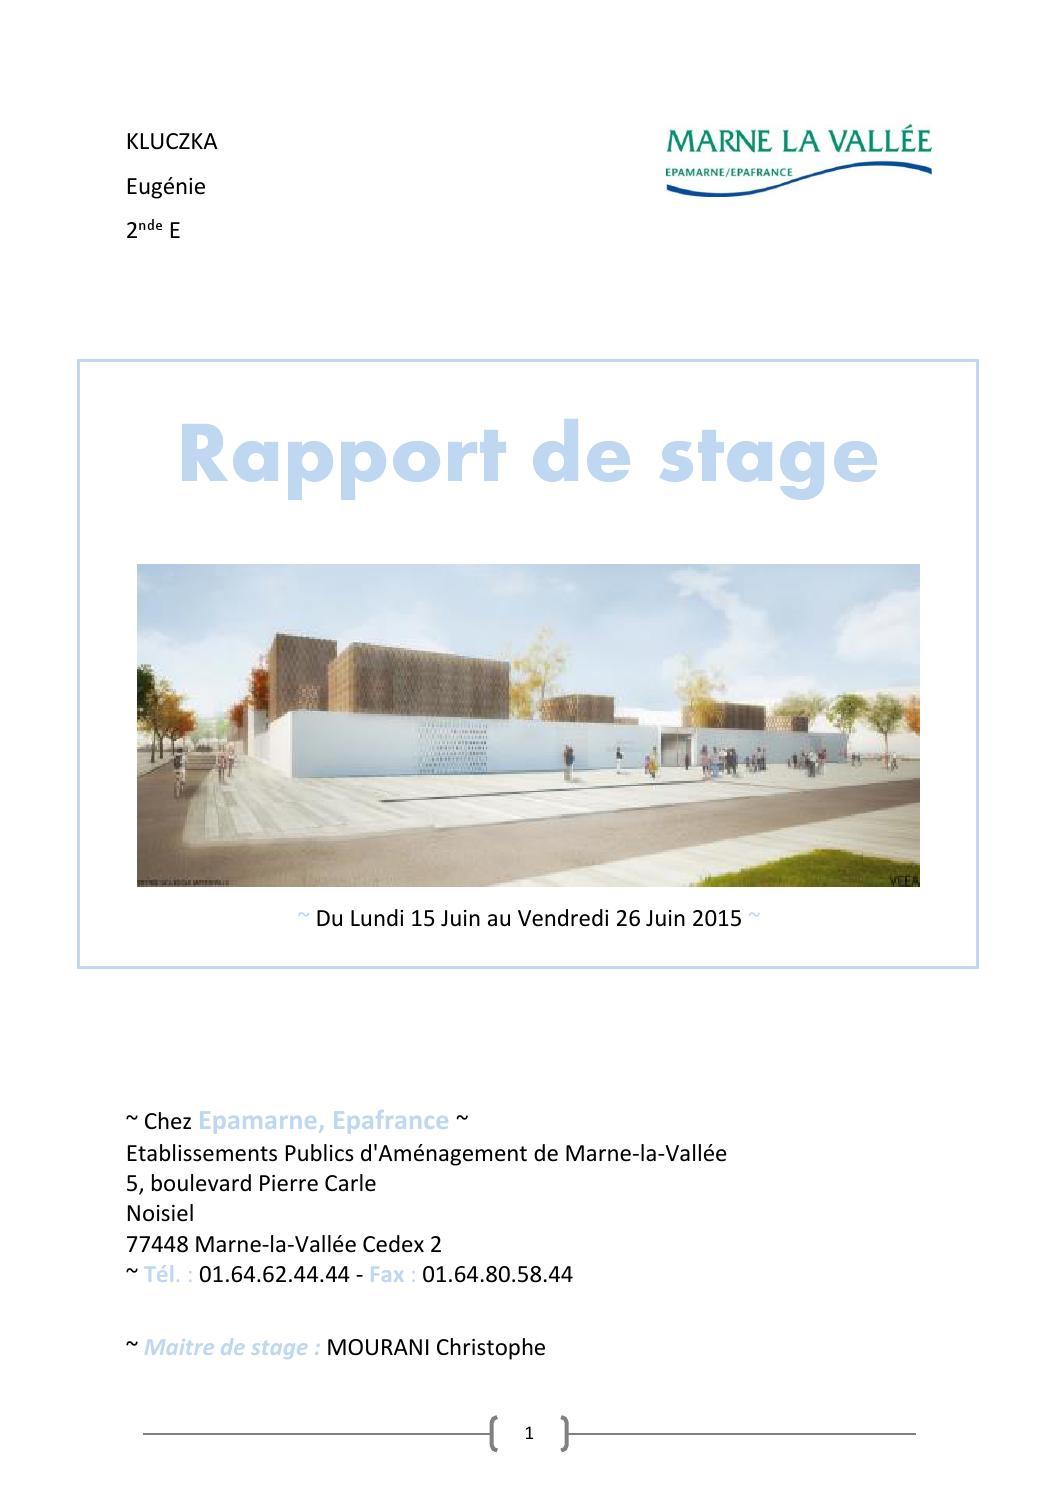 Rapport de stage epa by laure kluczka issuu for Introduction rapport de stage cuisine